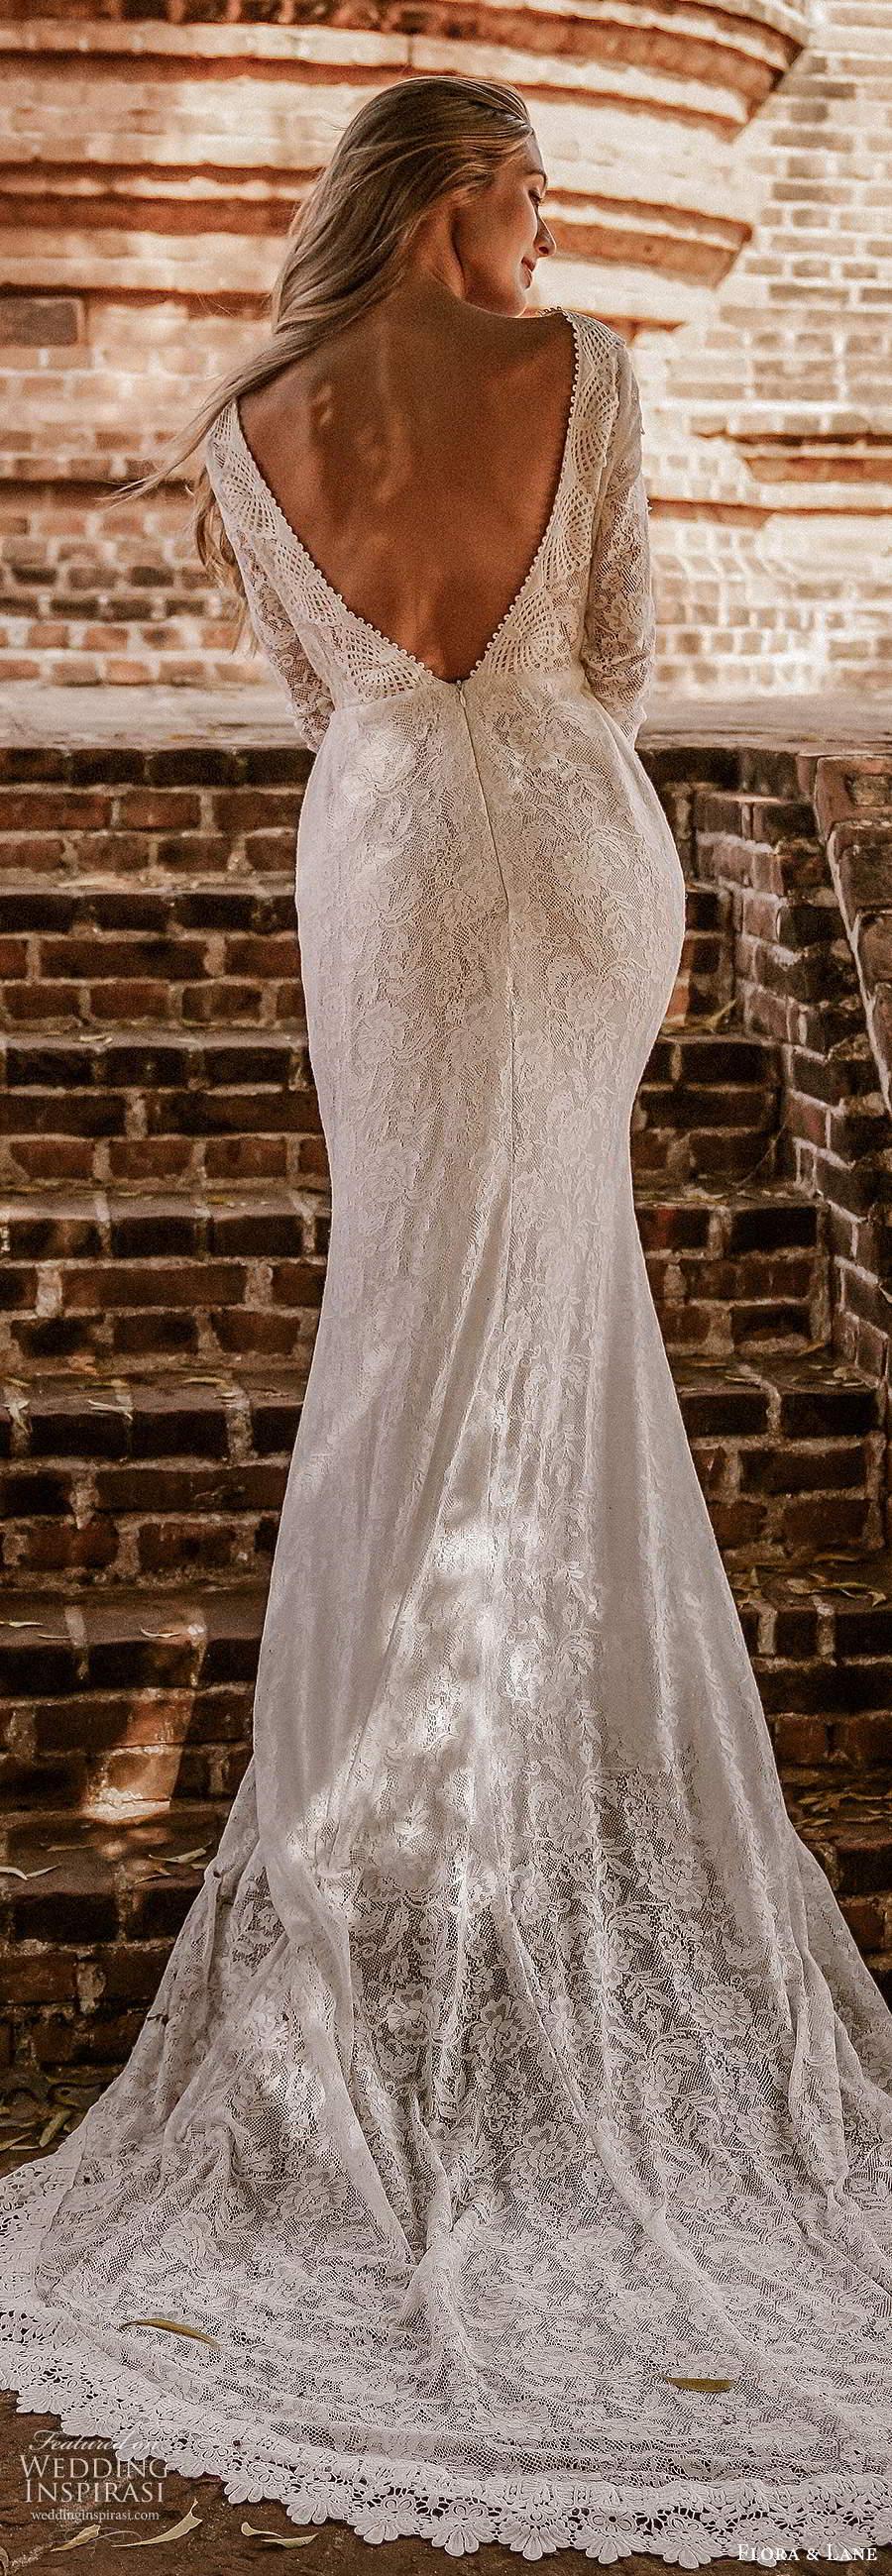 flora and lane 2019 bridal flutter sleeves scoop neckline fully embellished lace sheath romantic boho wedding dress scoop back chapel train (4) lv